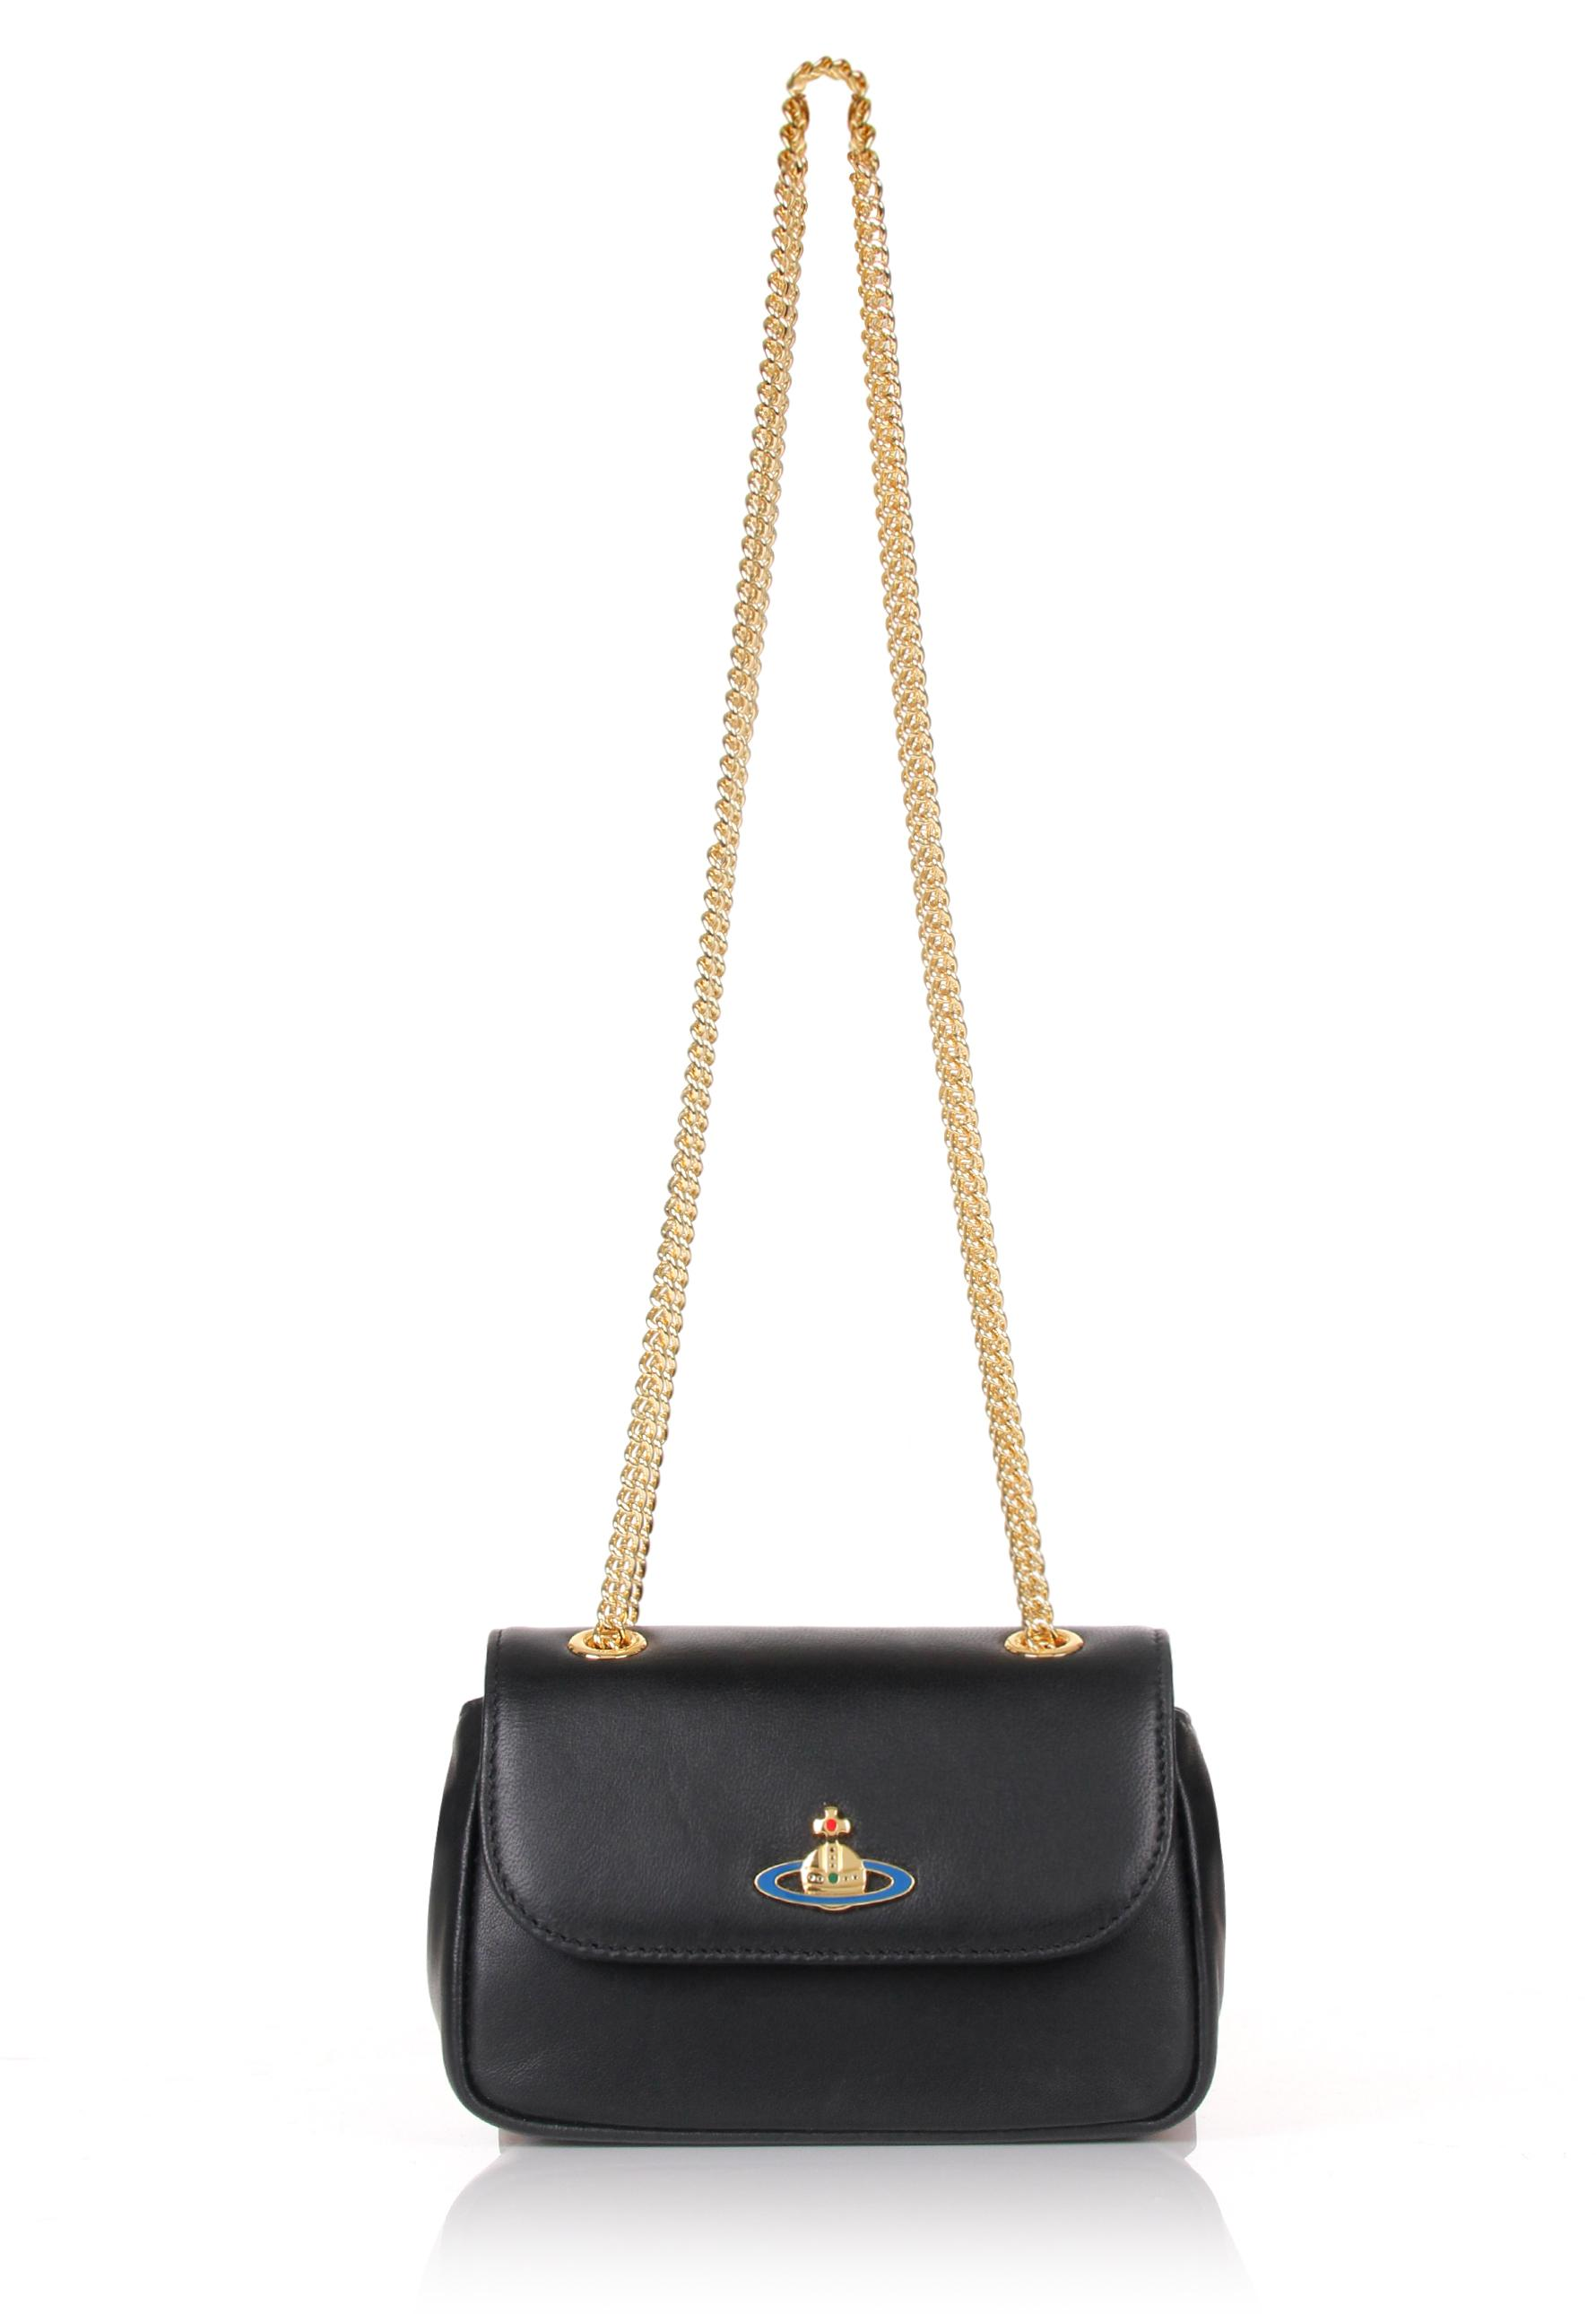 7366b820a0 Lyst - Vivienne Westwood Nappa 7150 Mini Crossbody Bag Black in Black